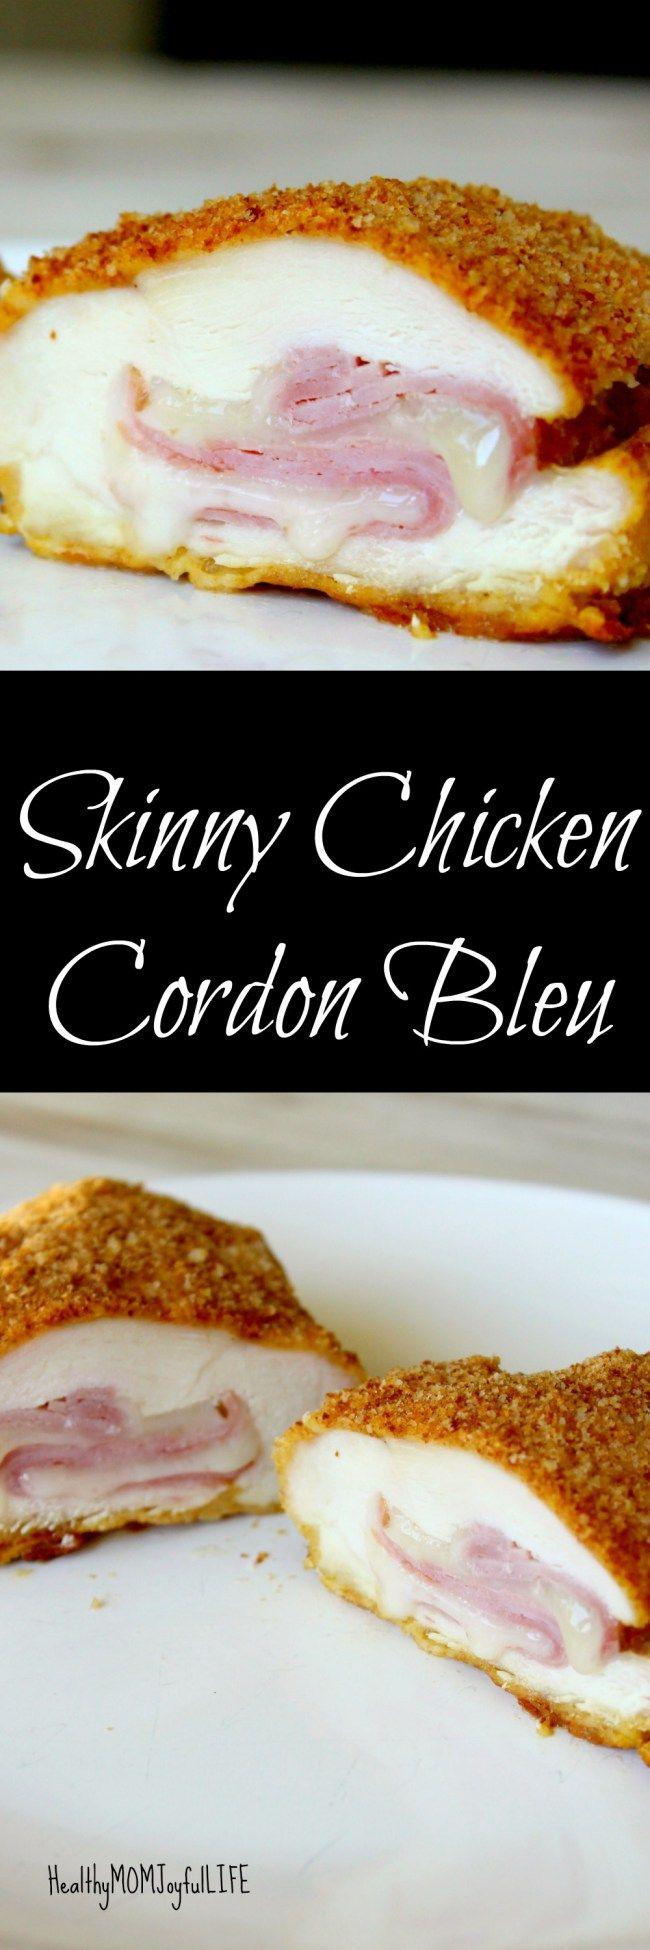 Skinny Chicken Cordon Bleu @ http://www.healthymomjoyfullife.com/2017/03/skinny-chicken-cordon-bleu/.html